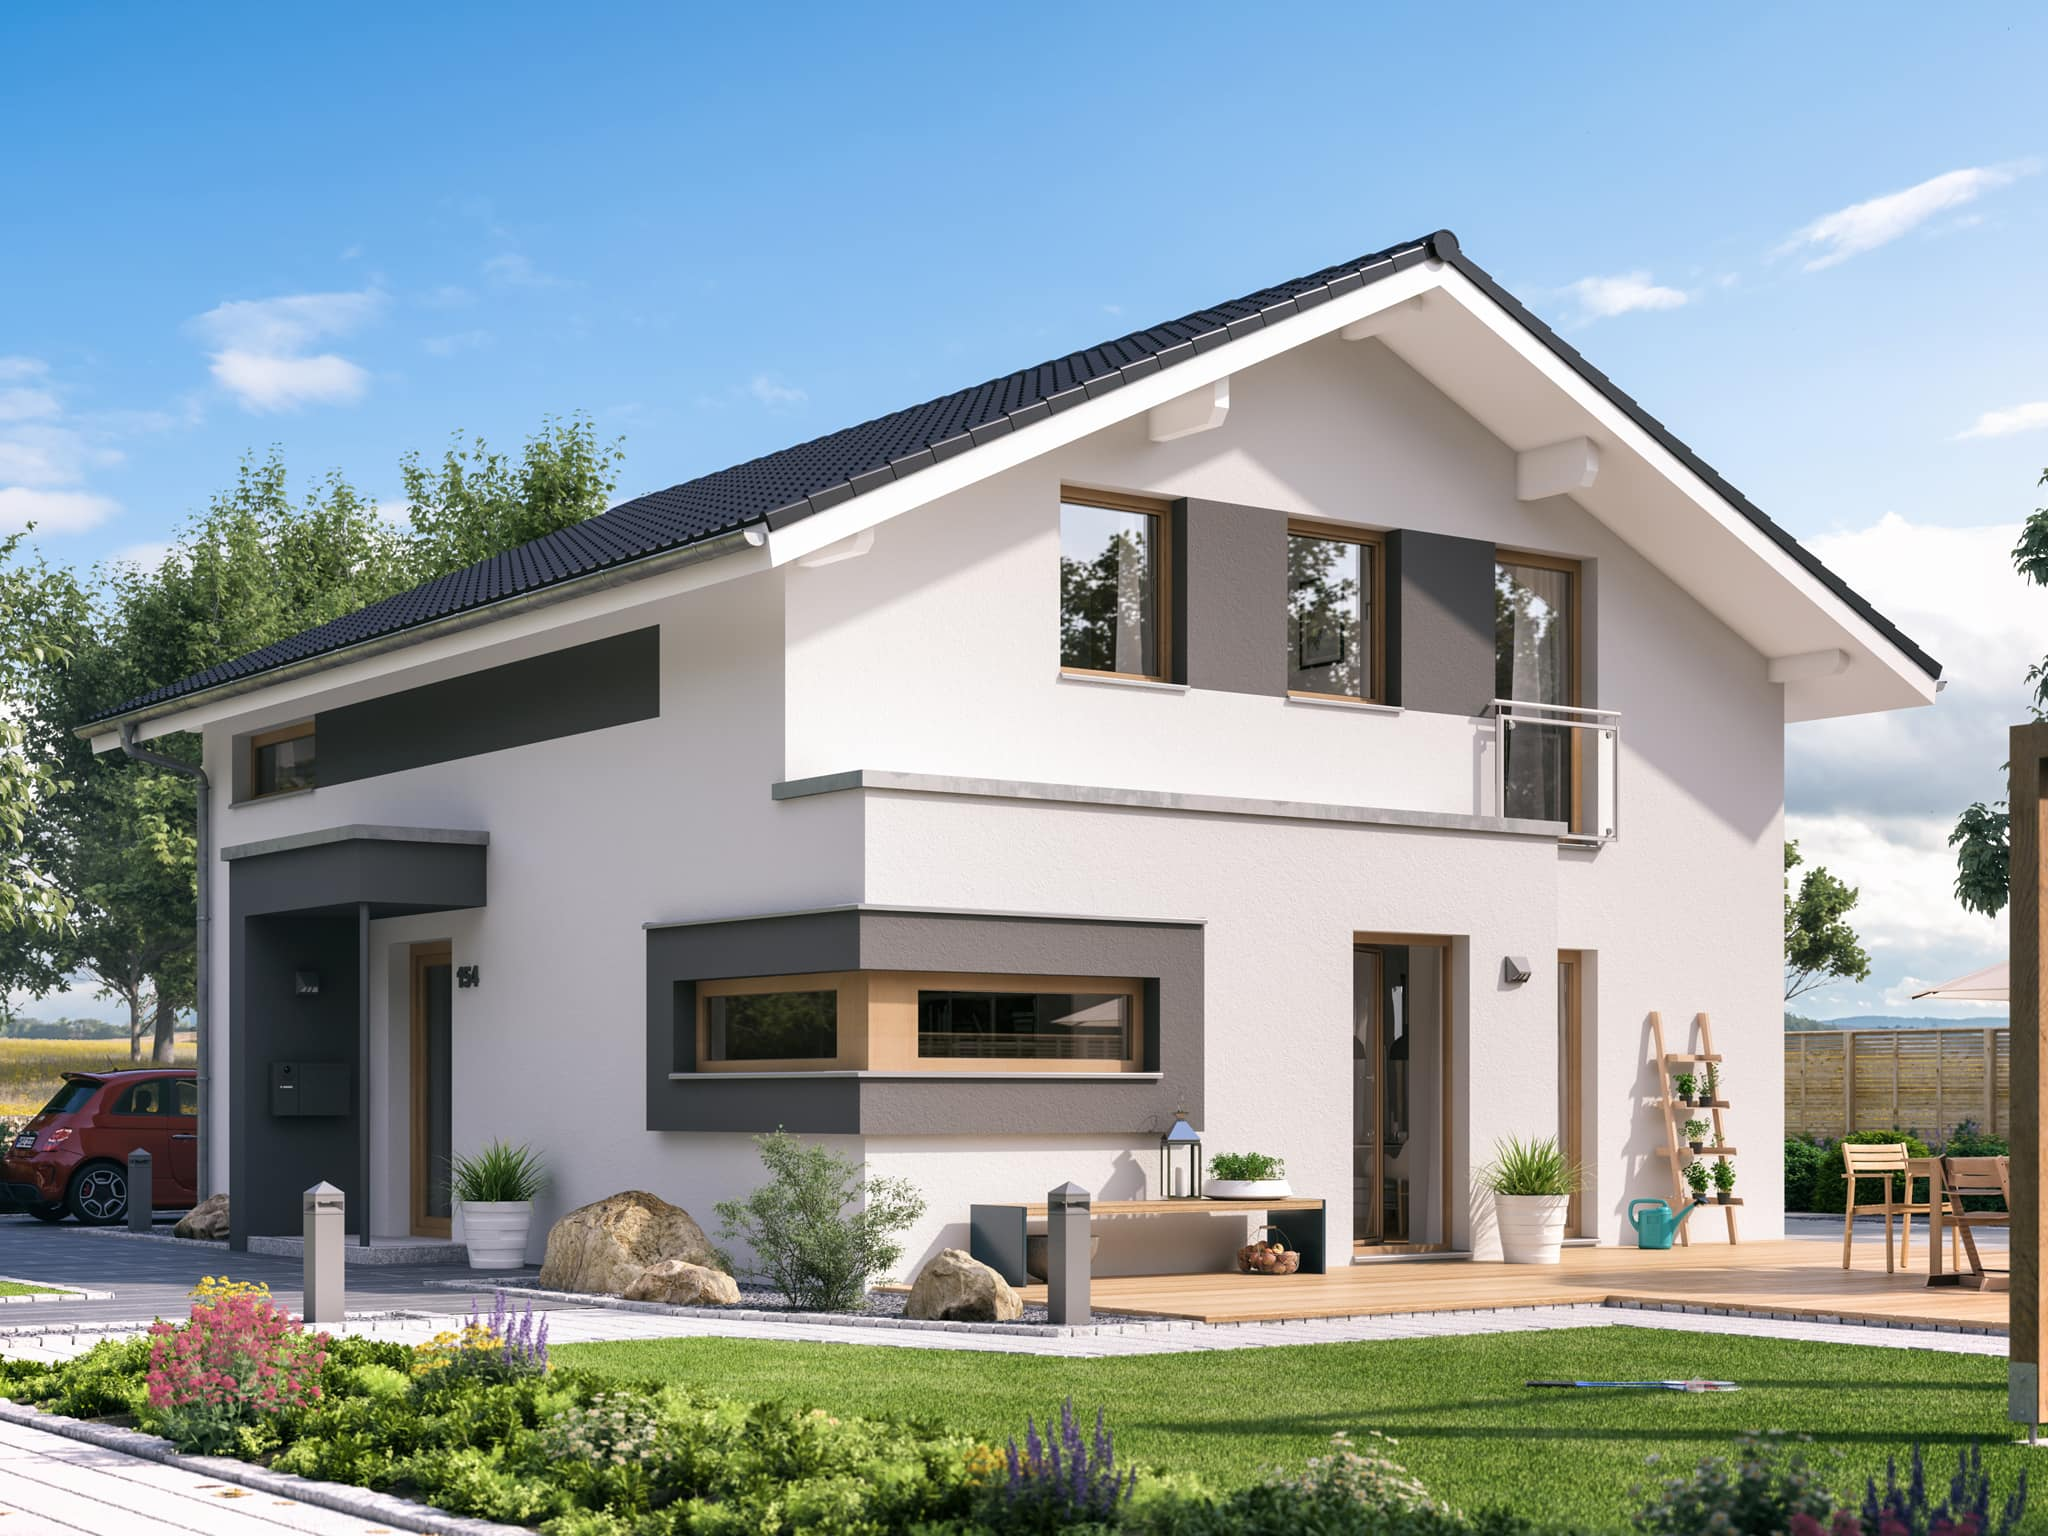 Haus Design modern mit Satteldach & Putz Fassade mit Erker, 5 Zimmer Grundriss, 150 qm - Fertighaus Living Haus SUNSHINE 154 V5 - HausbauDirekt.de